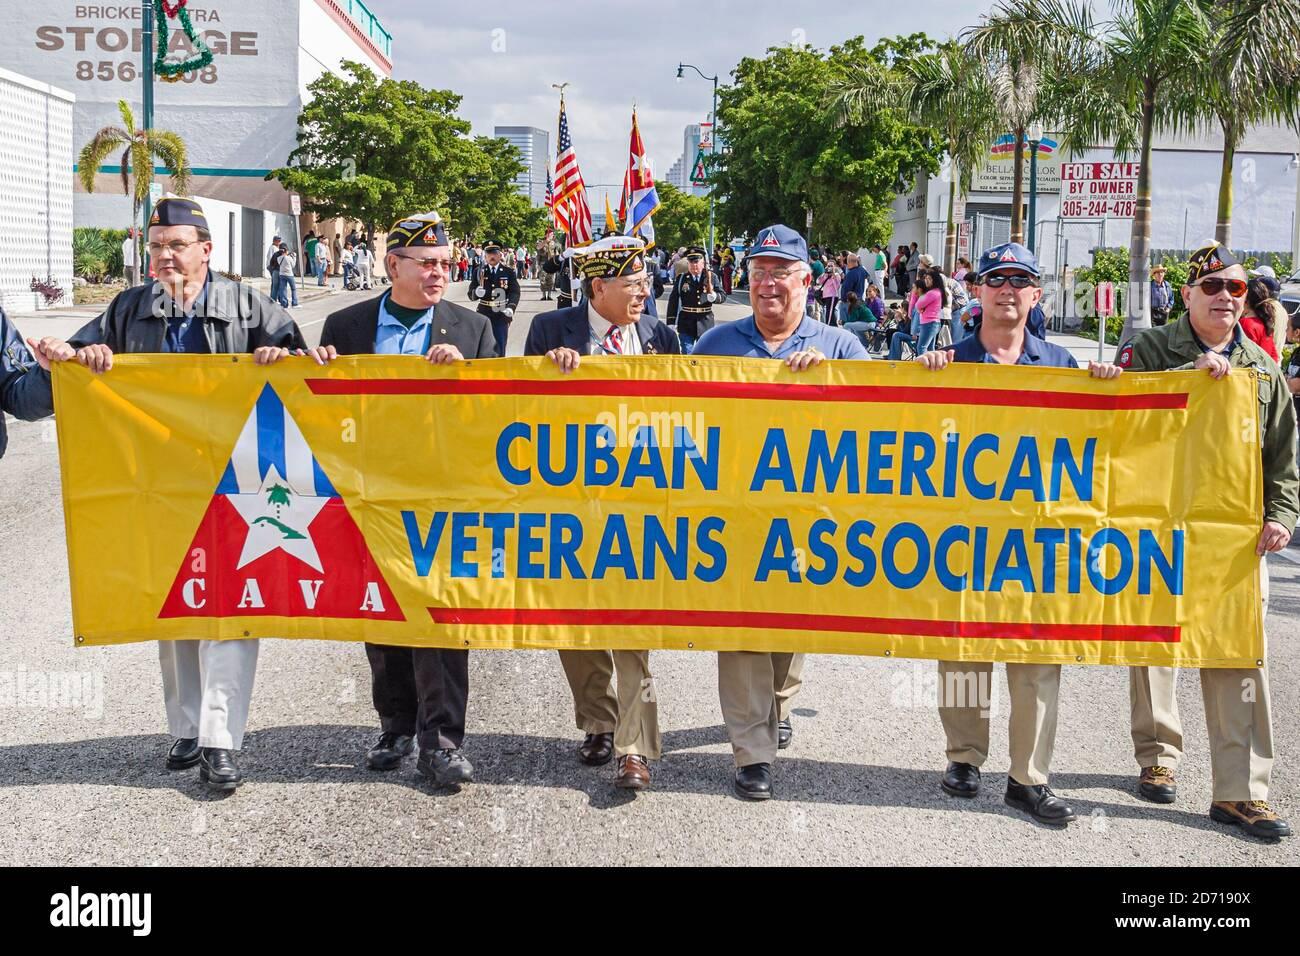 Floride Miami Little Havana, Hispaniques hispaniques immigrants Calle Ocho, Tres Reyes Magos trois 3 Kings Parade Cuban American Veterans Association, Banque D'Images